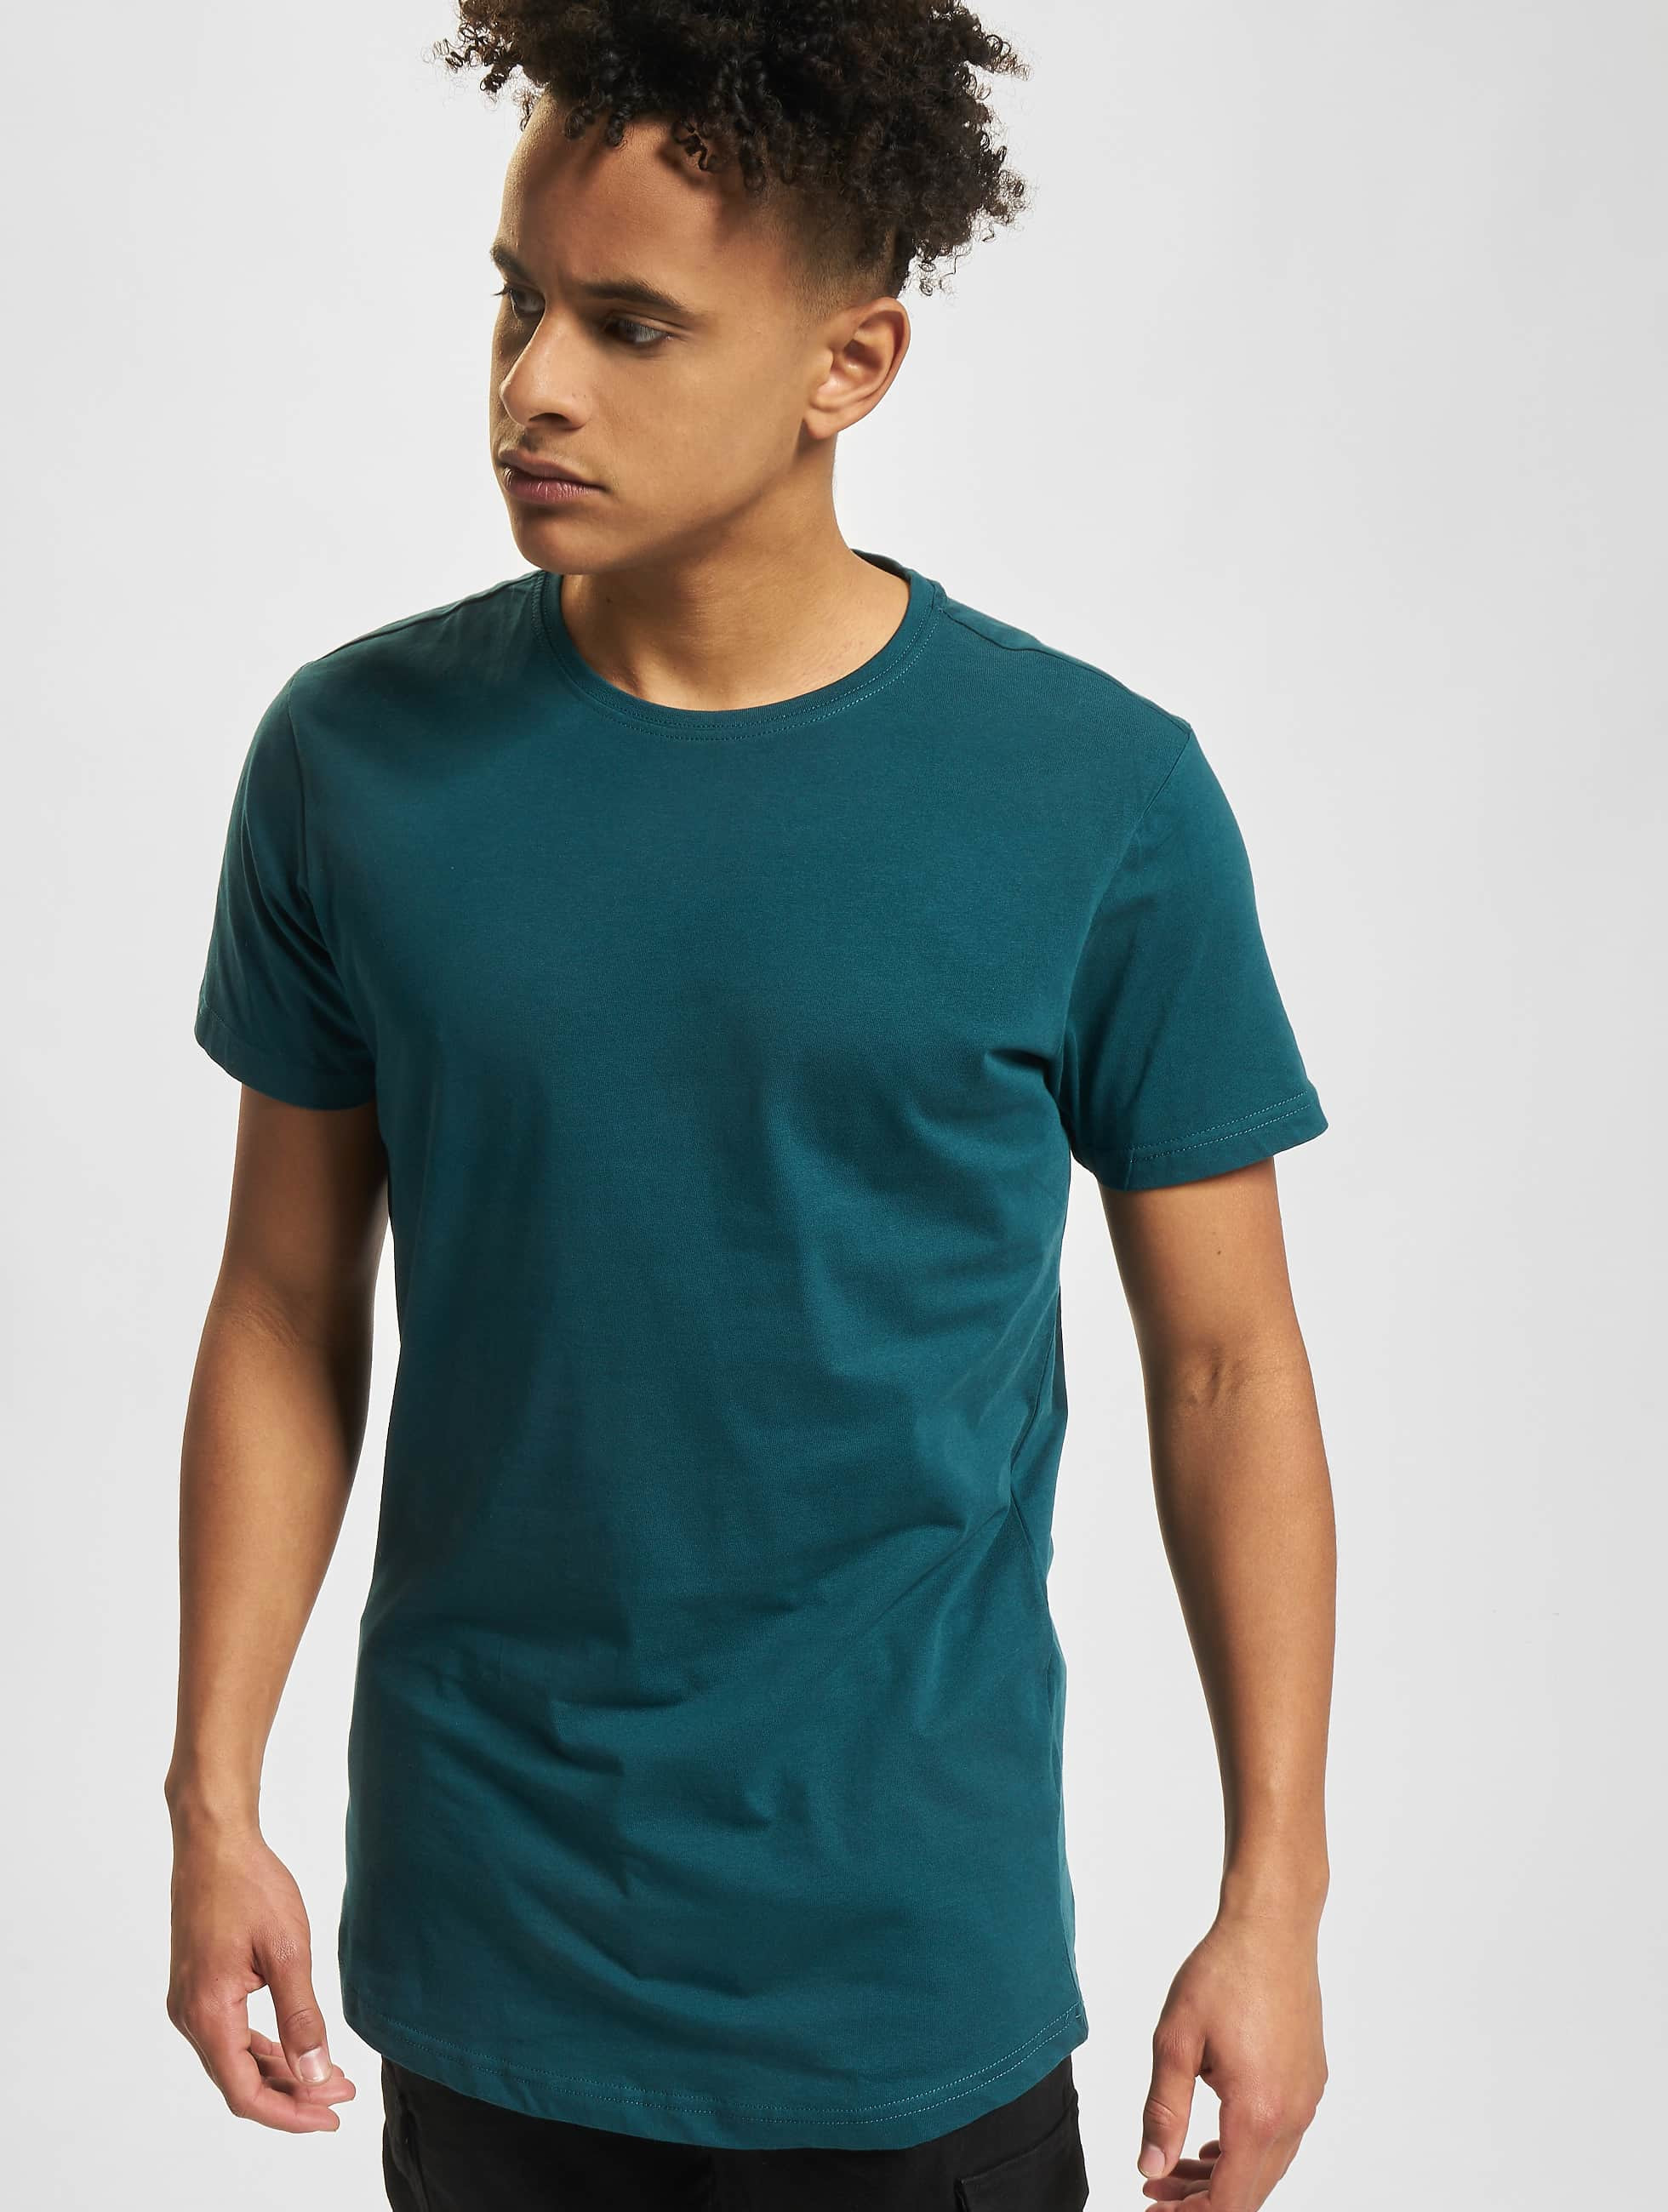 Urban Classics Tall Tees Shaped Oversized zelený